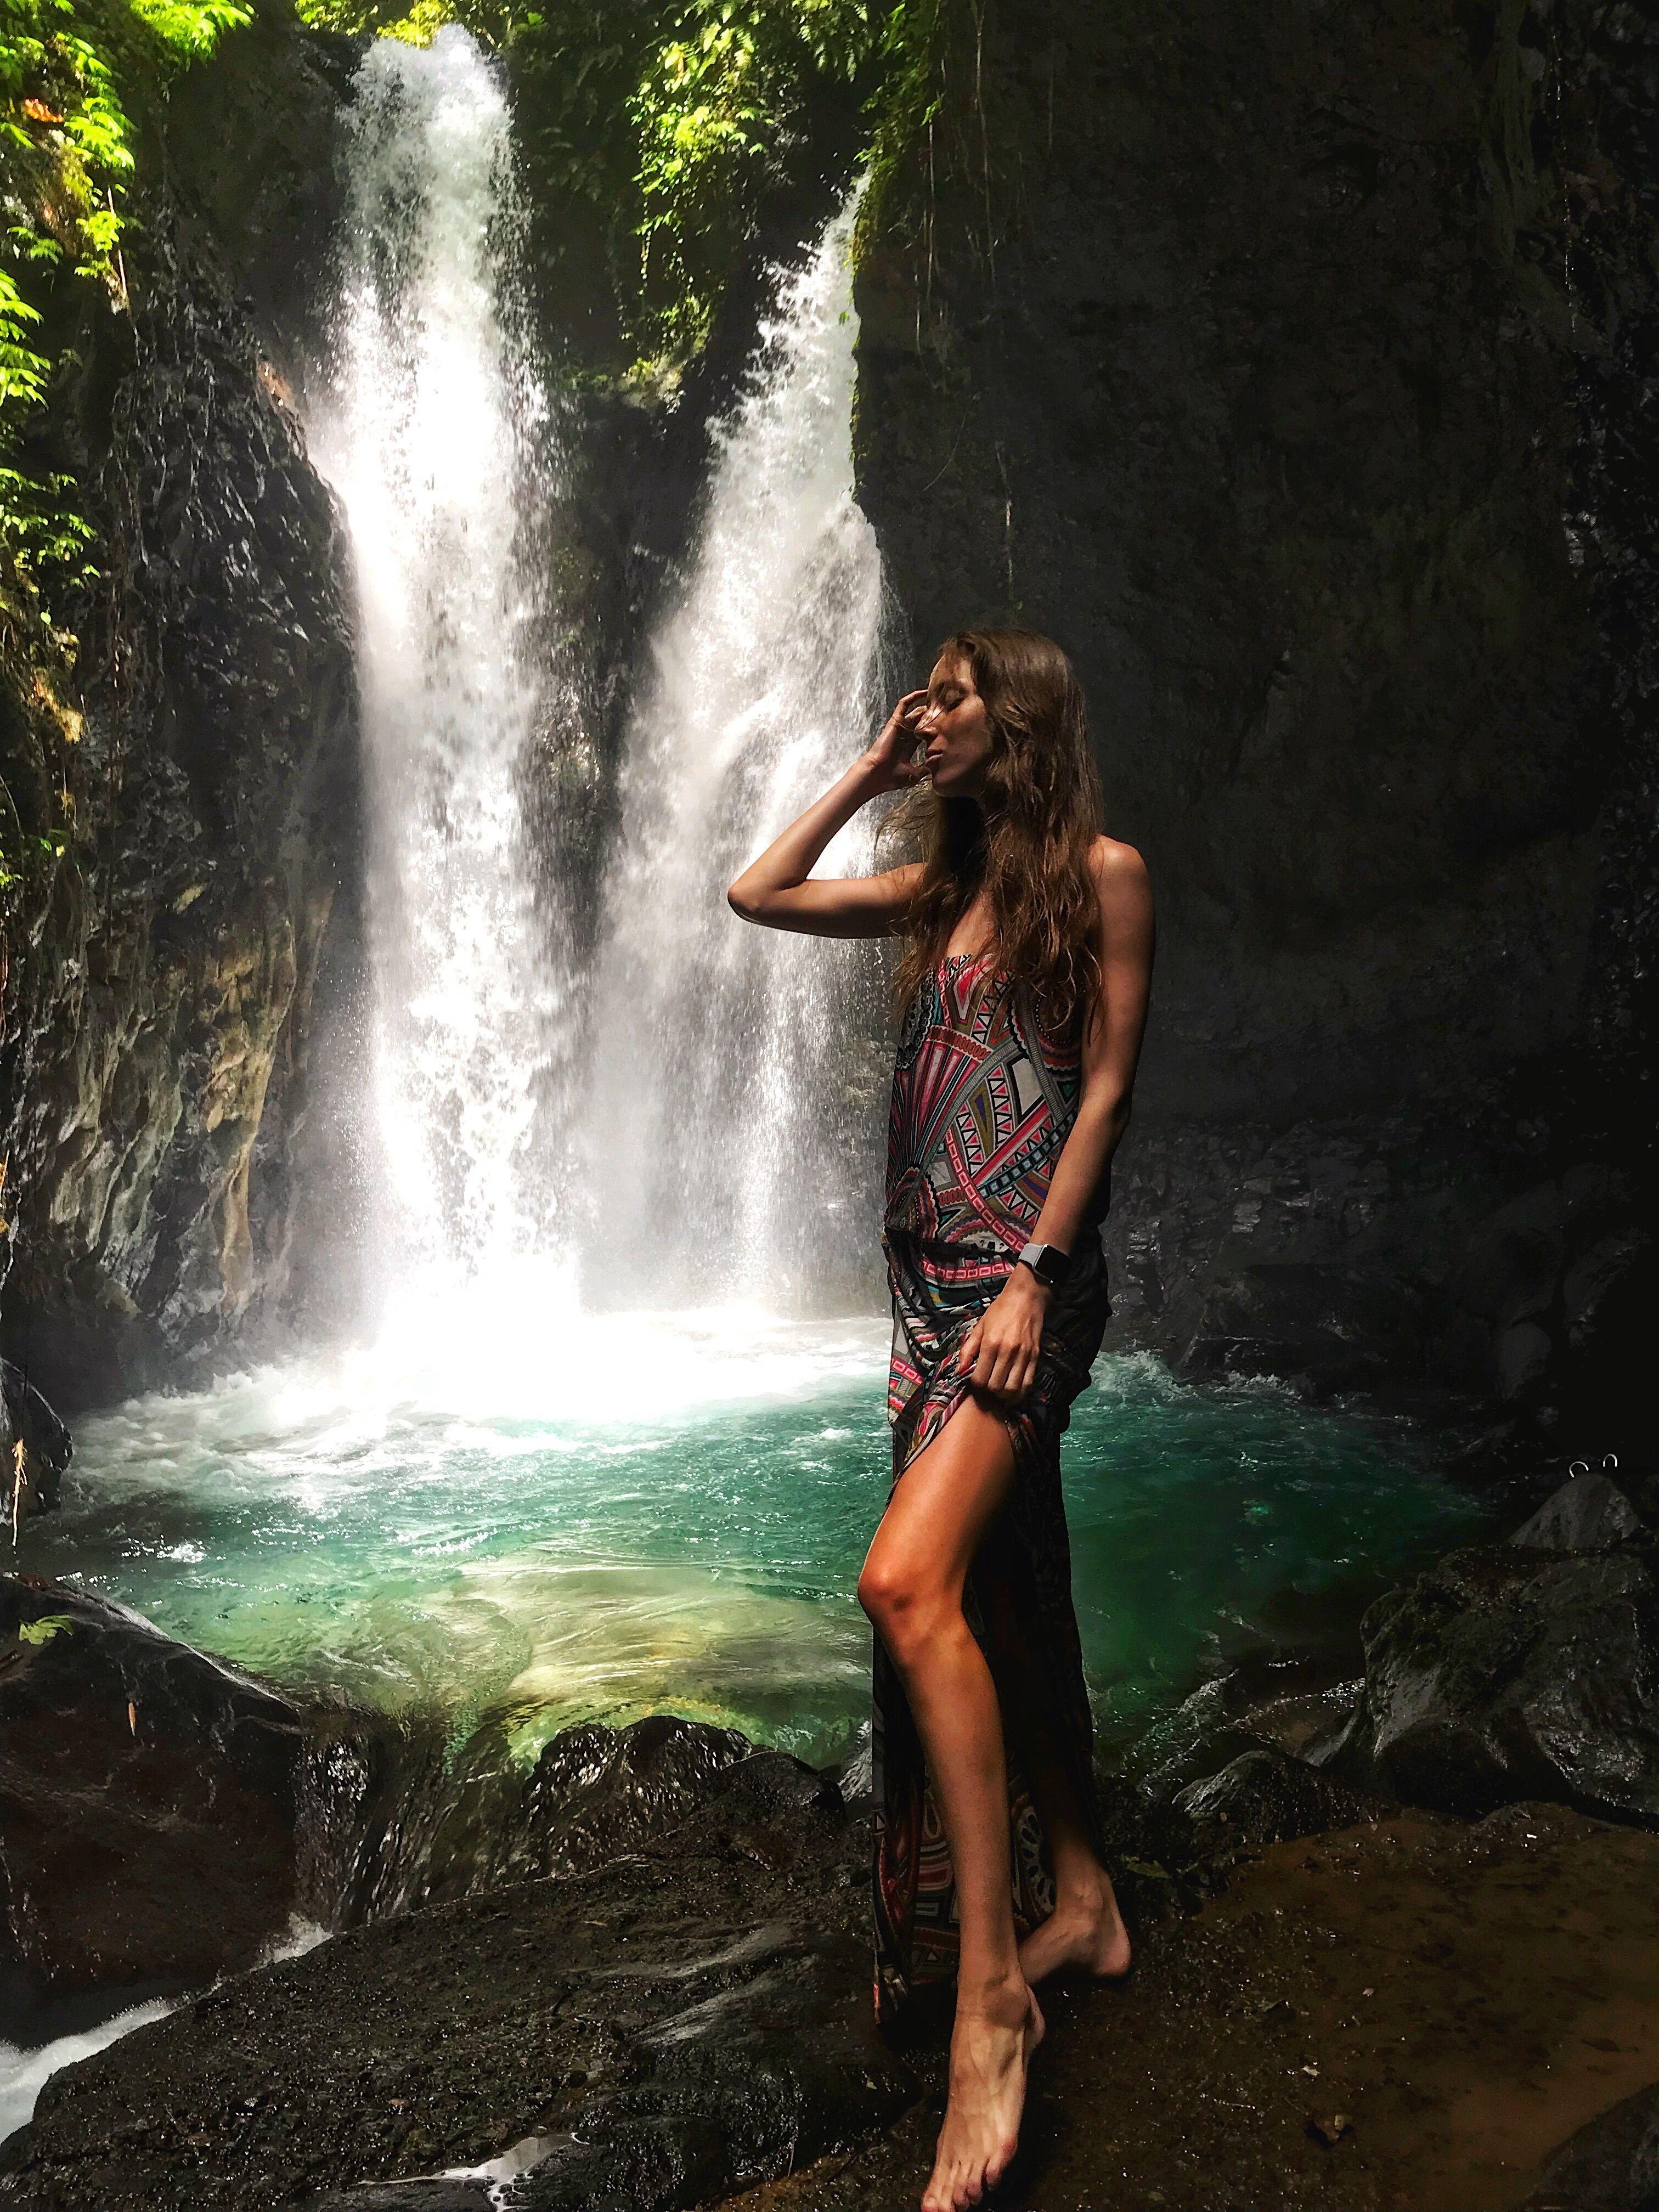 bali indonesia waterfall girl gitgit девушка